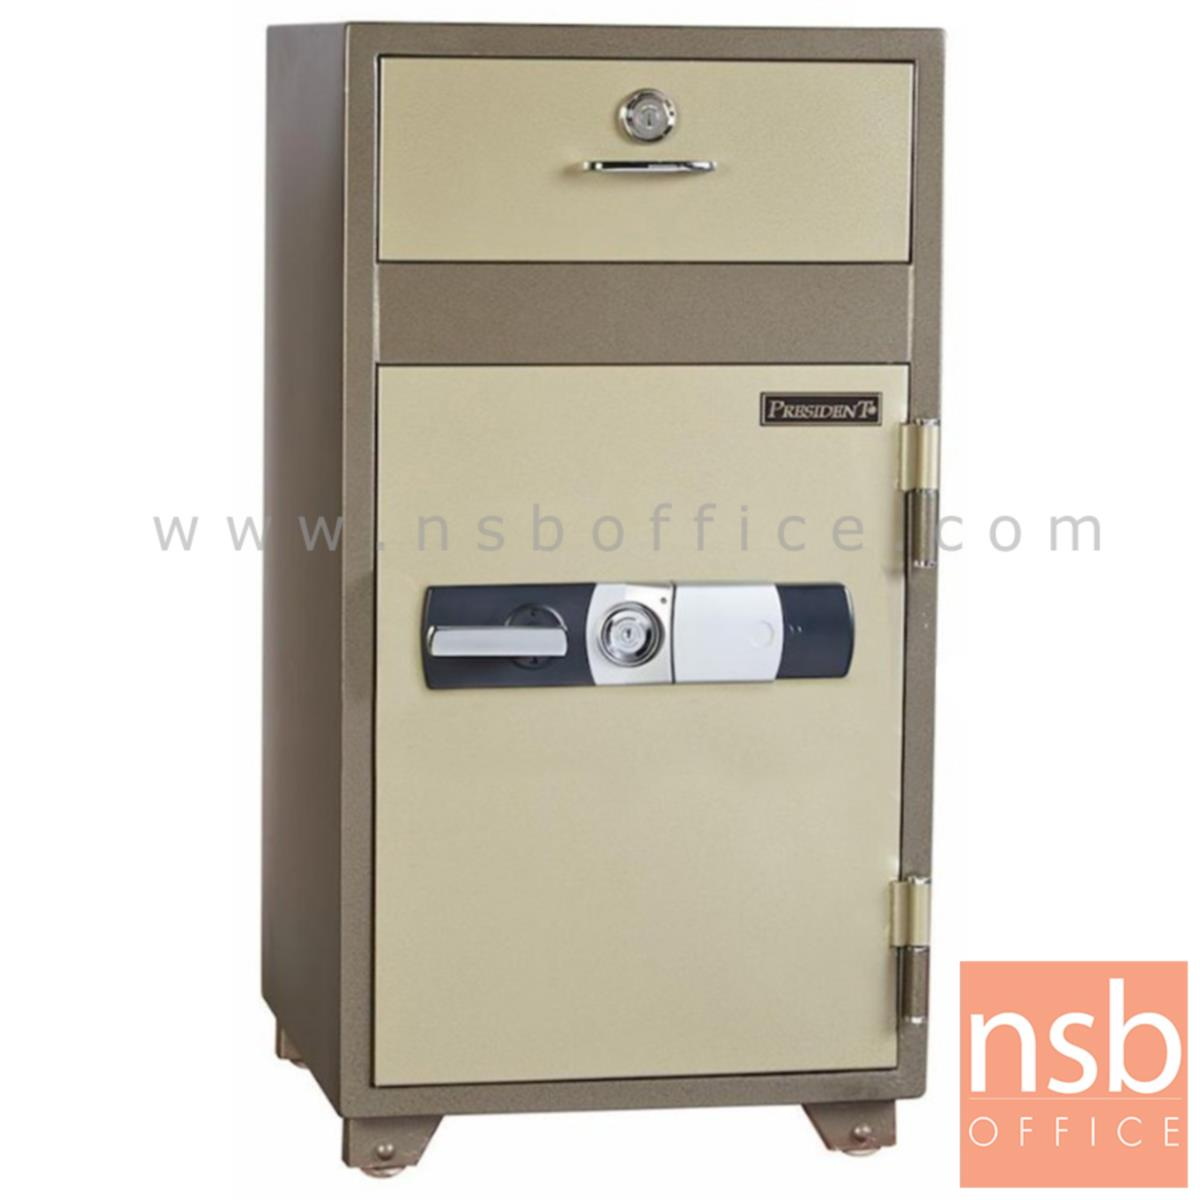 F05A074:ตู้เซฟนิรภัยชนิดดิจิตอล รุ่น PRESIDENT-ND-100D  มี 2 กุญแจ 1 รหัส (รหัสใช้กดหน้าตู้)